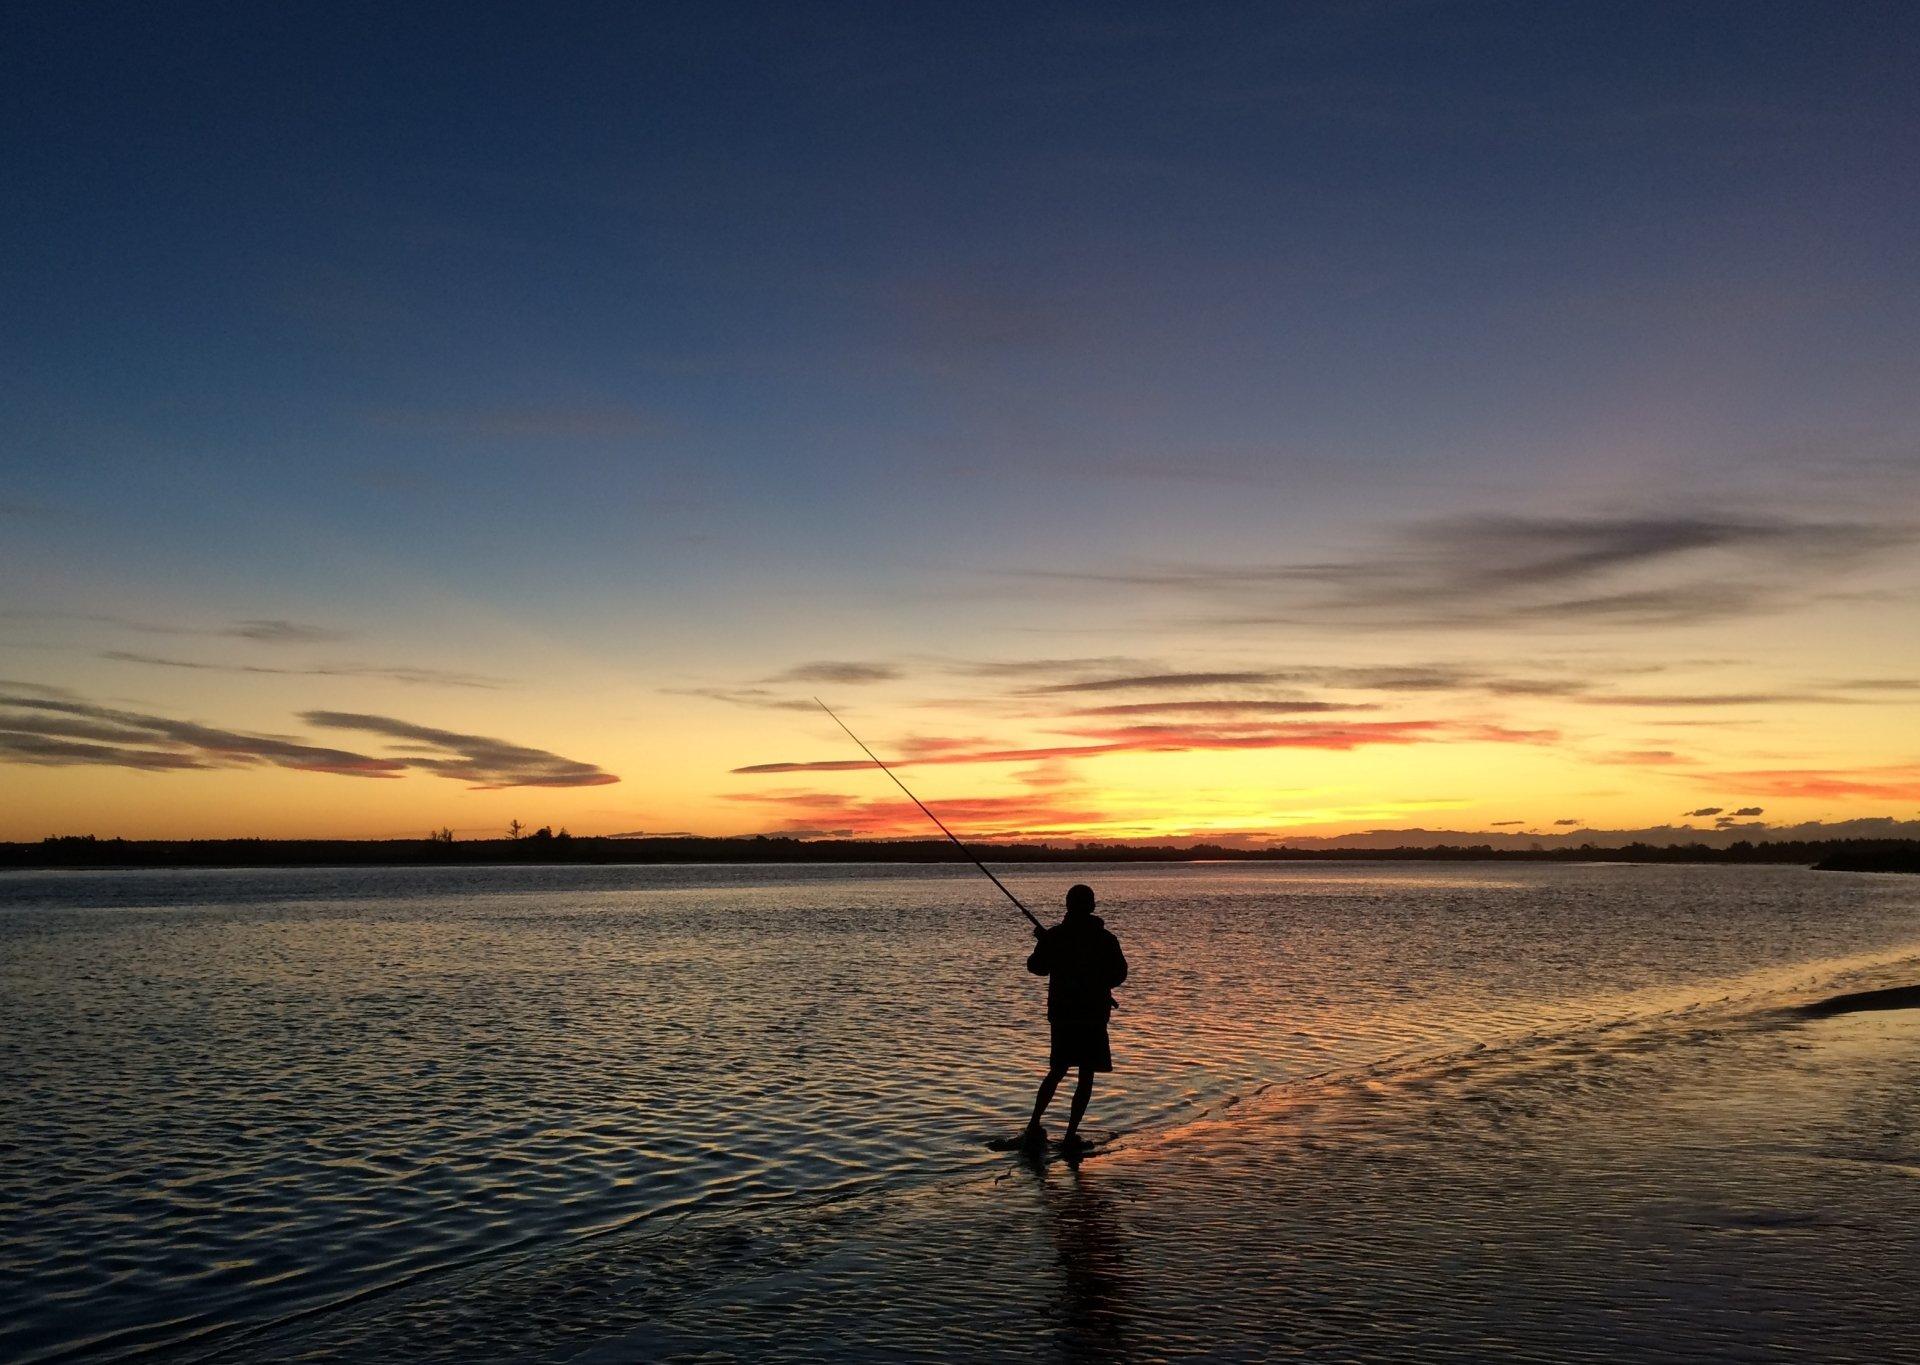 Sports - Fishing  Silhouette Sunset River Wallpaper